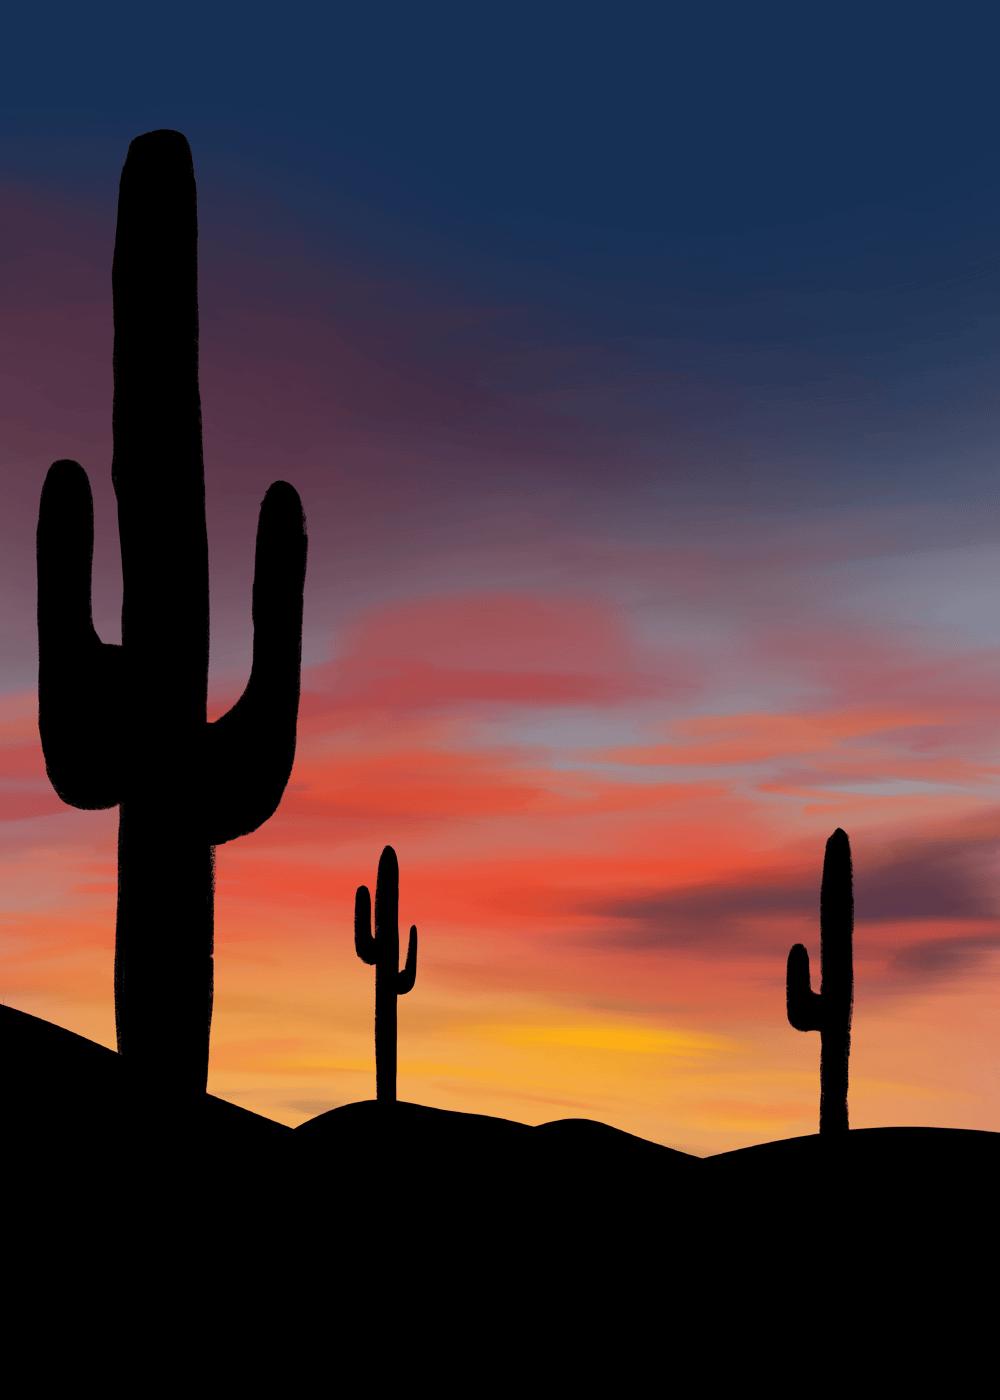 Desert Cactus - image 1 - student project